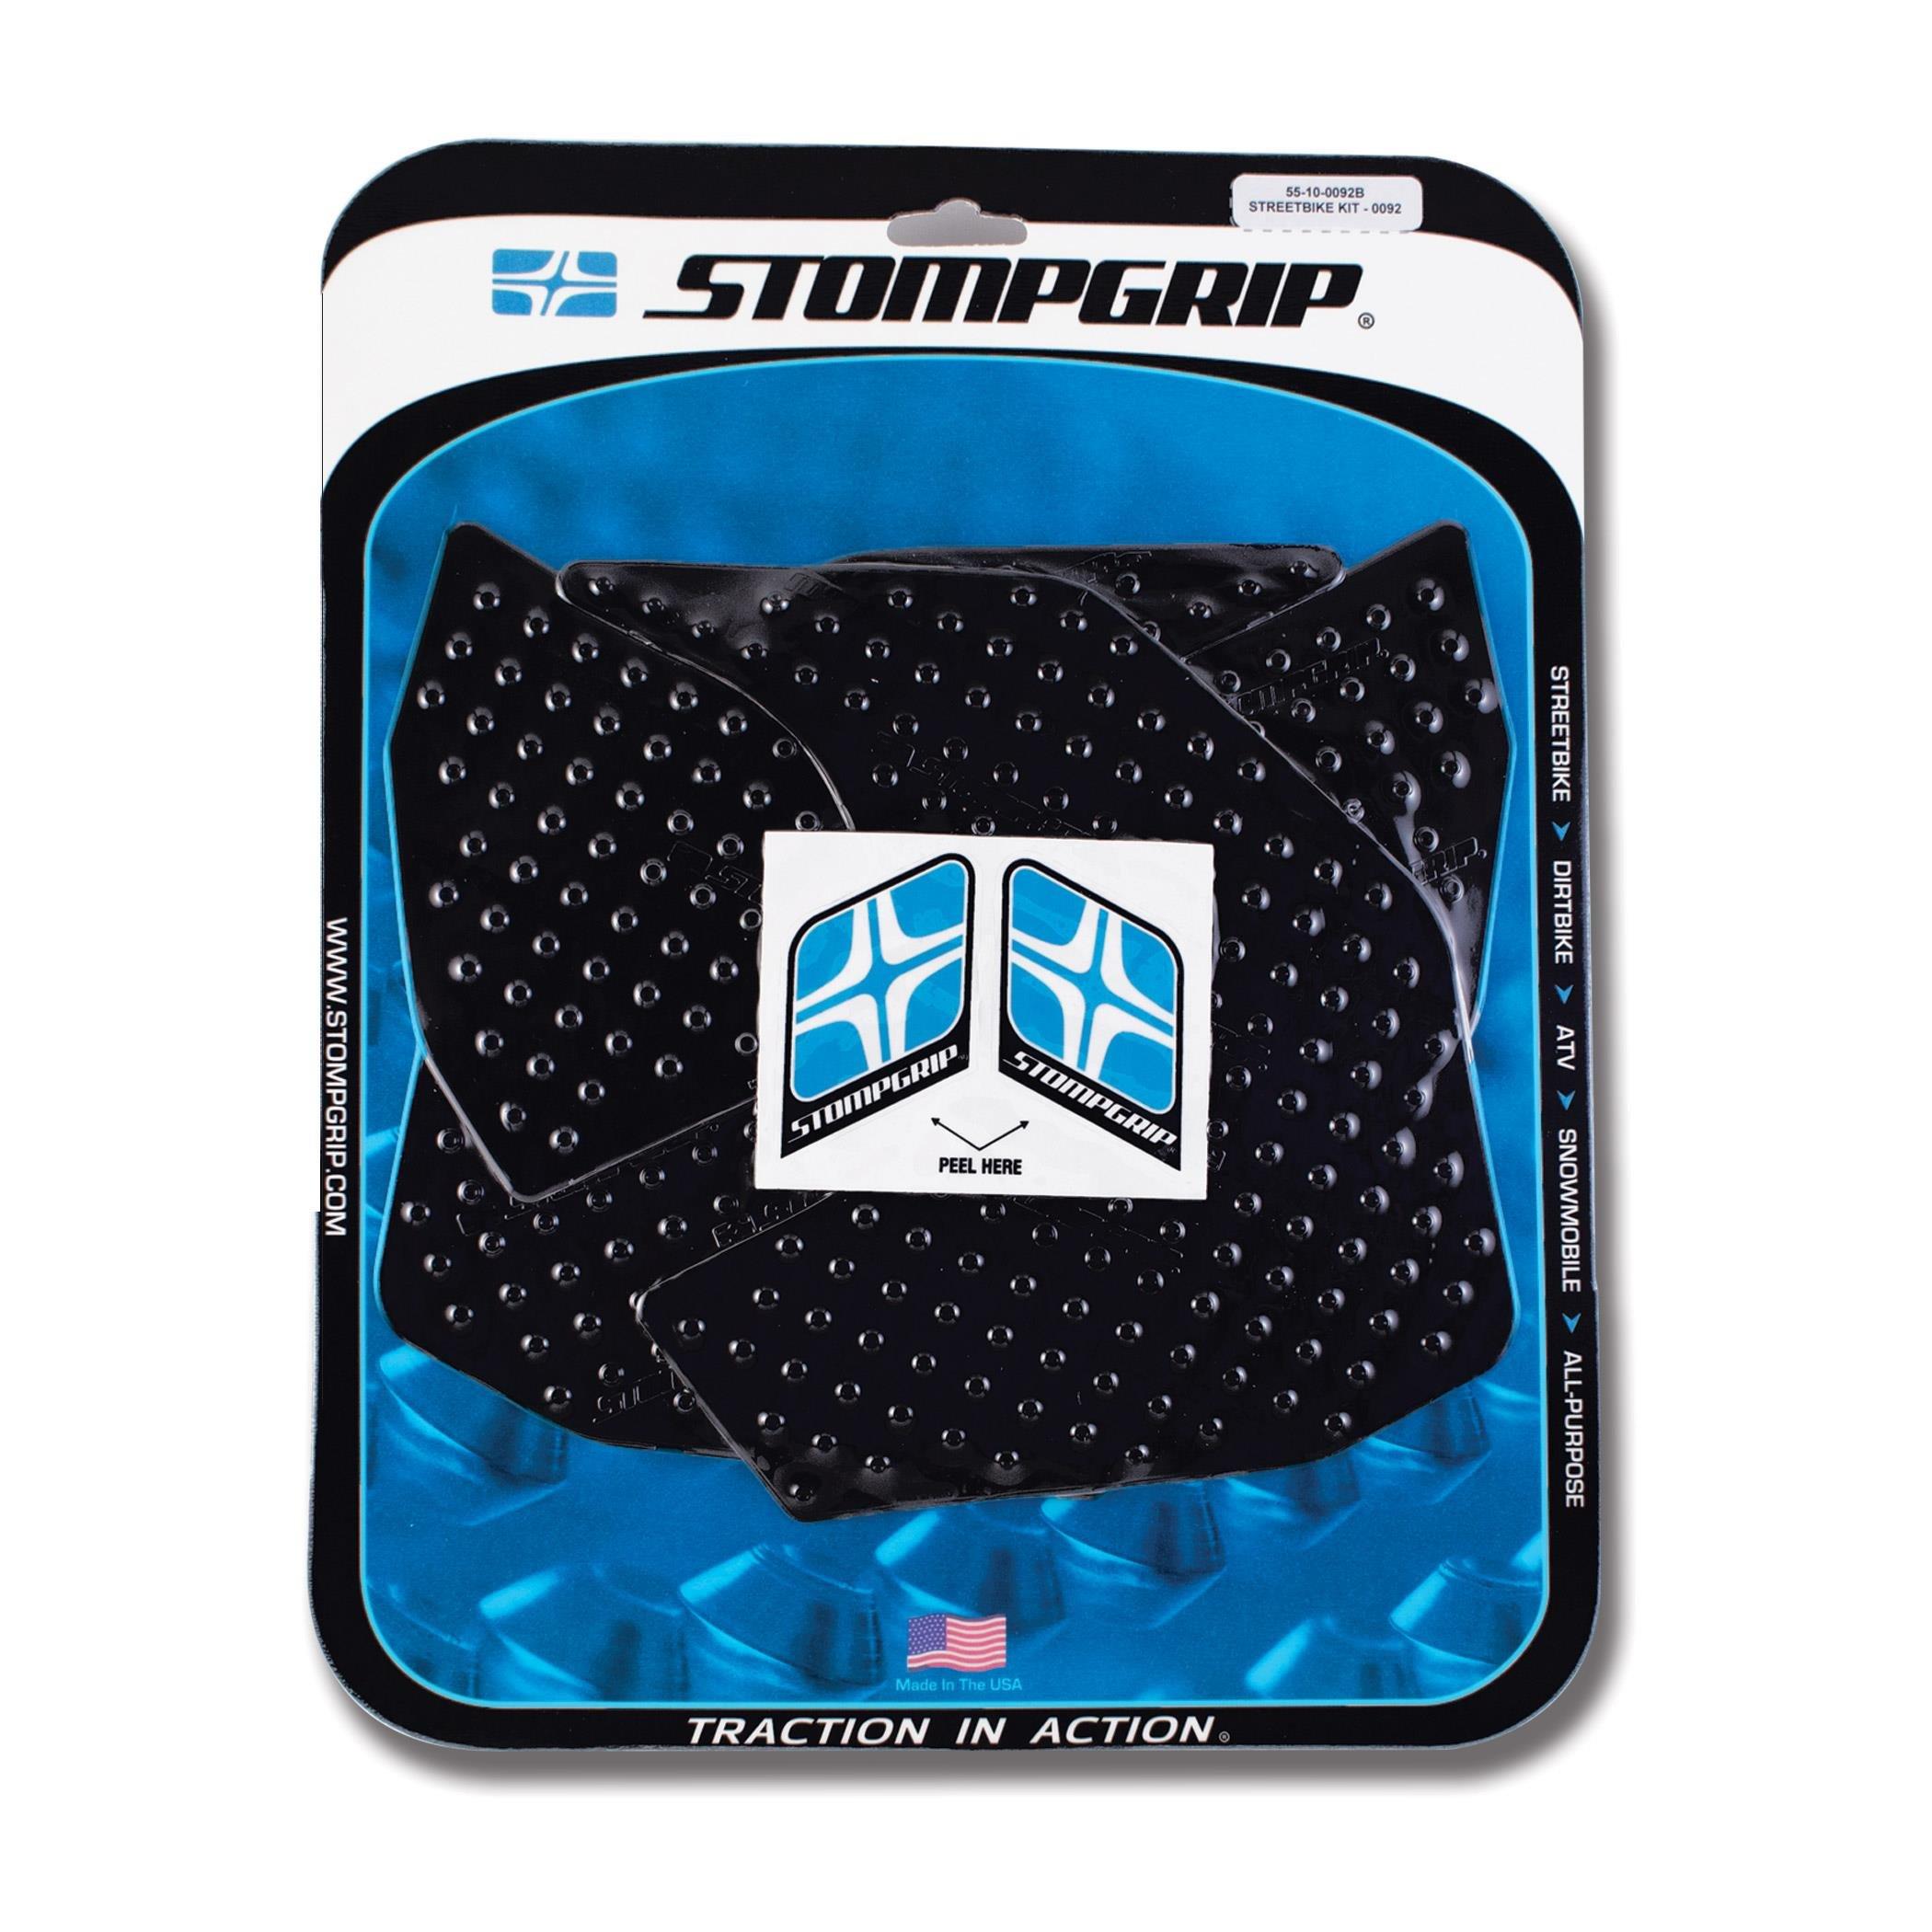 14-17 YAMAHA FZ-09: Stomp Grip Traction Pads (BLACK)